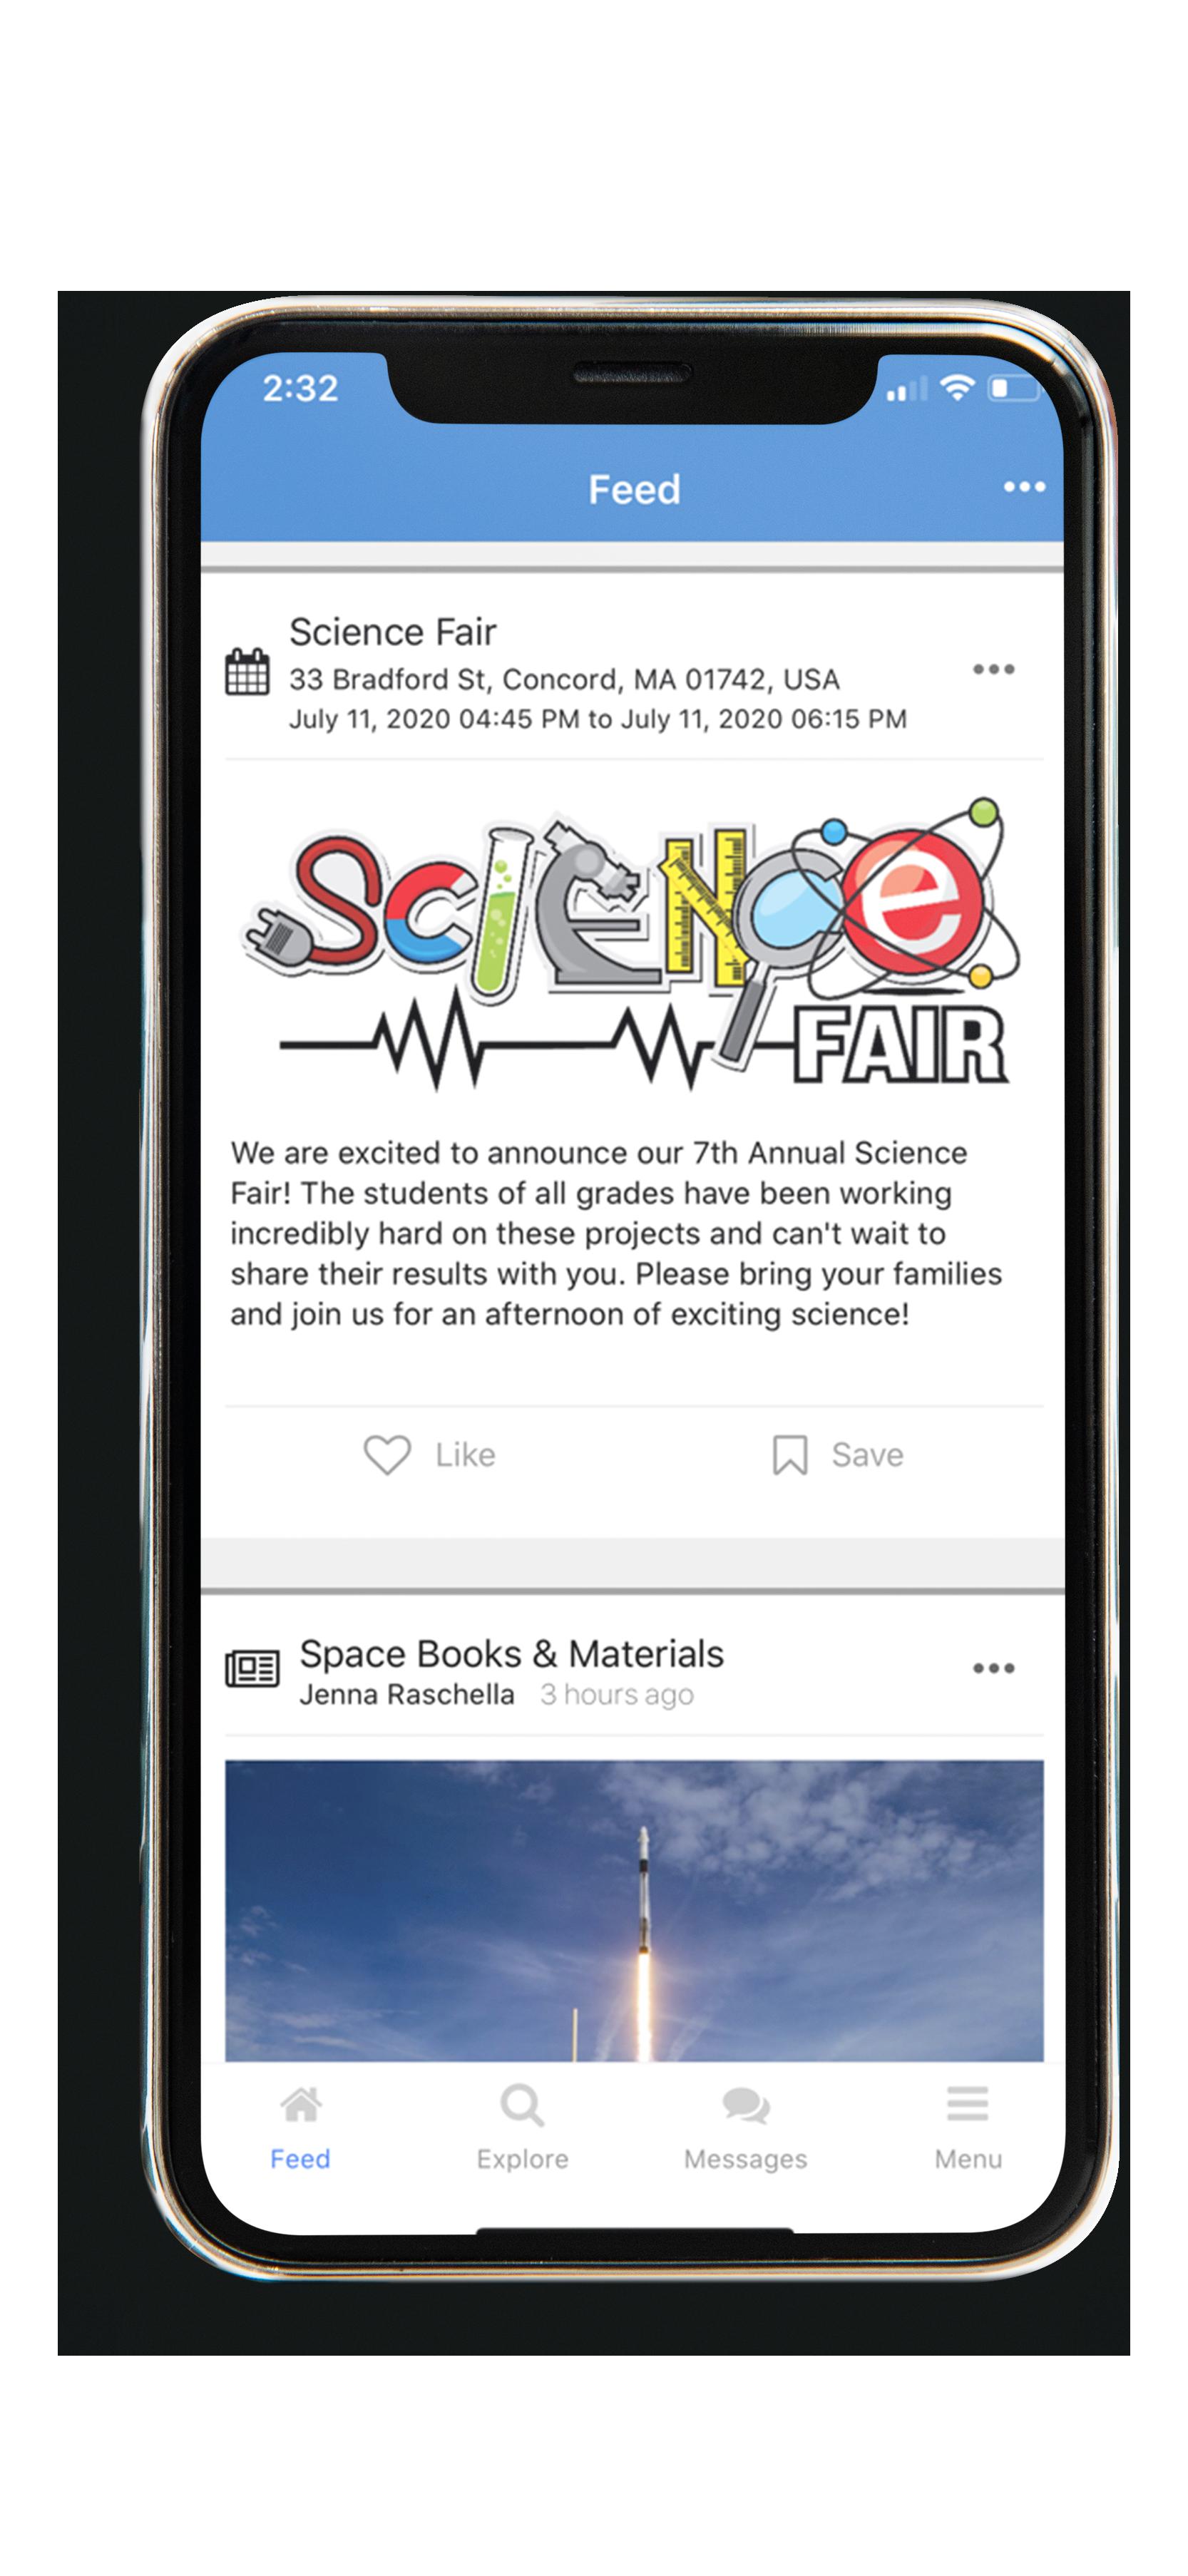 SchoolCNXT App News